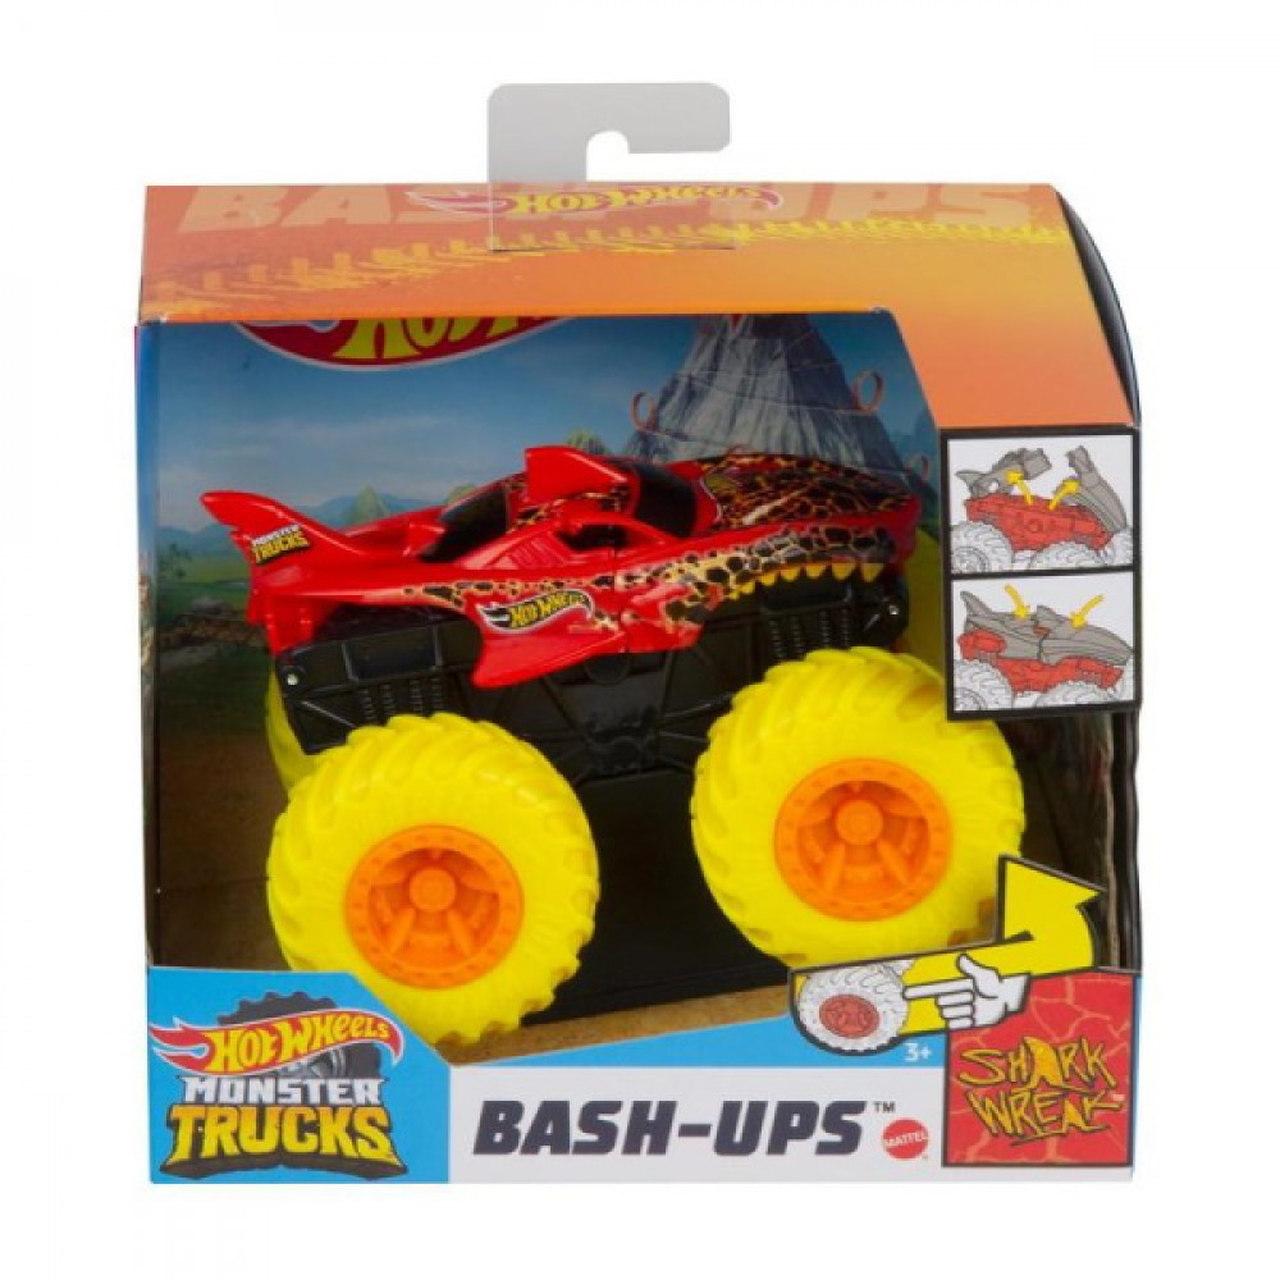 Hot Wheels Monster Truck 1:43 Shark Wreak